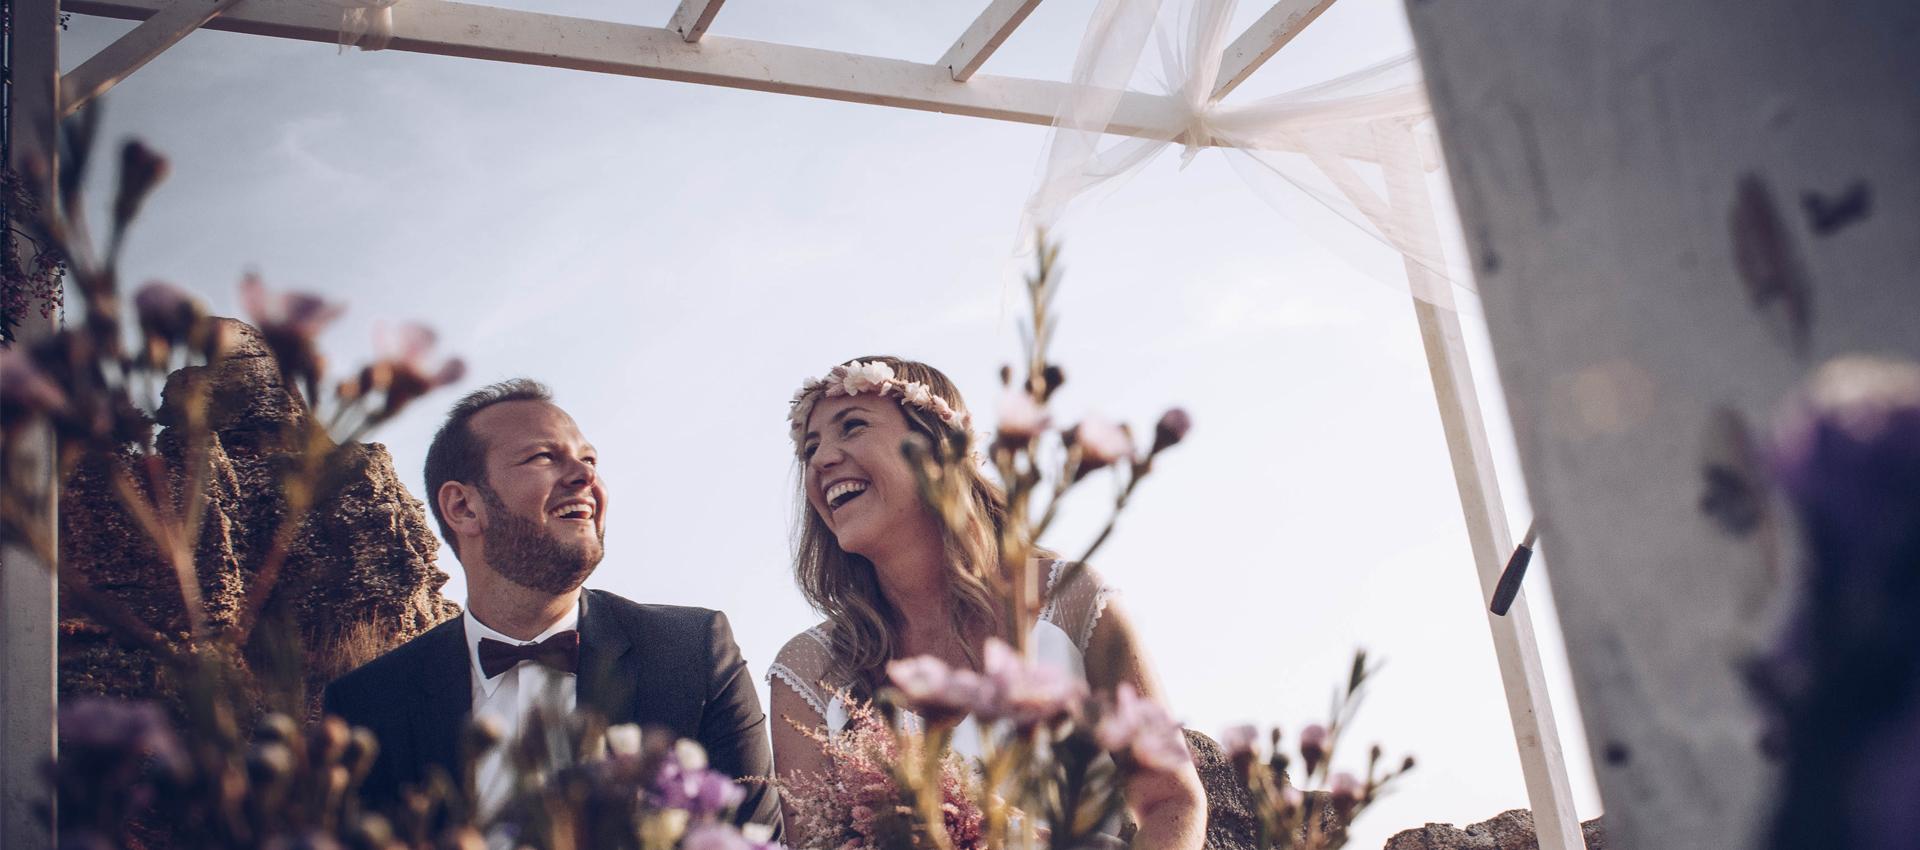 AlejandraJeremi Fotografía de Boda - video boda cadiz